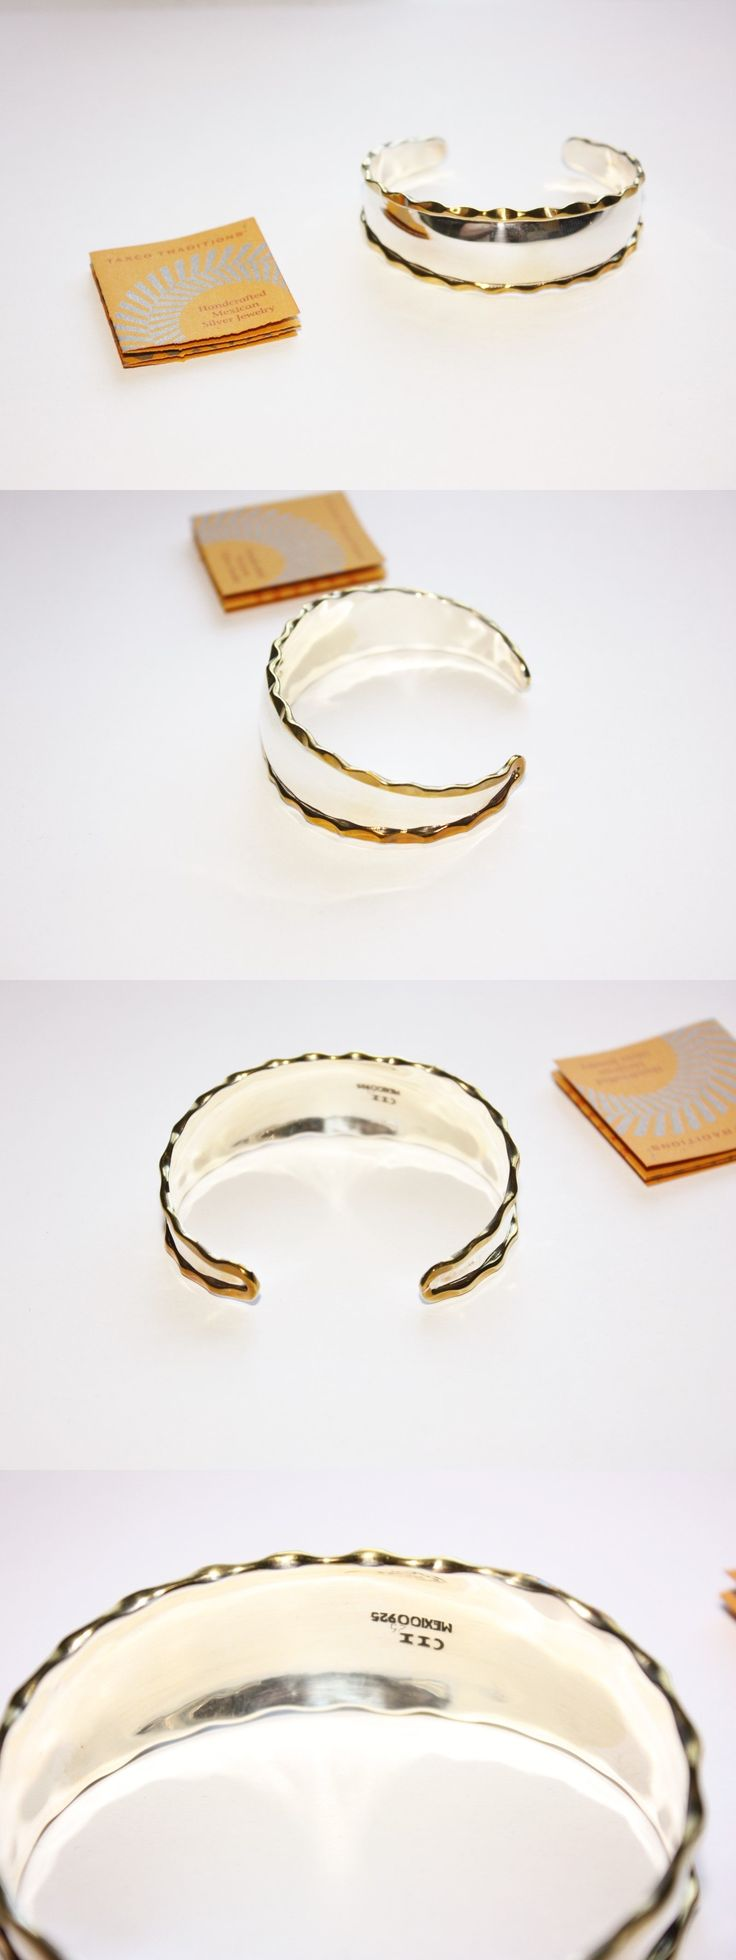 Bracelets 98489: Bnwot Qvc Artisan Crafted Taxco Sterling Silver W Brass Cuff Bracelet! -> BUY IT NOW ONLY: $44.95 on eBay!